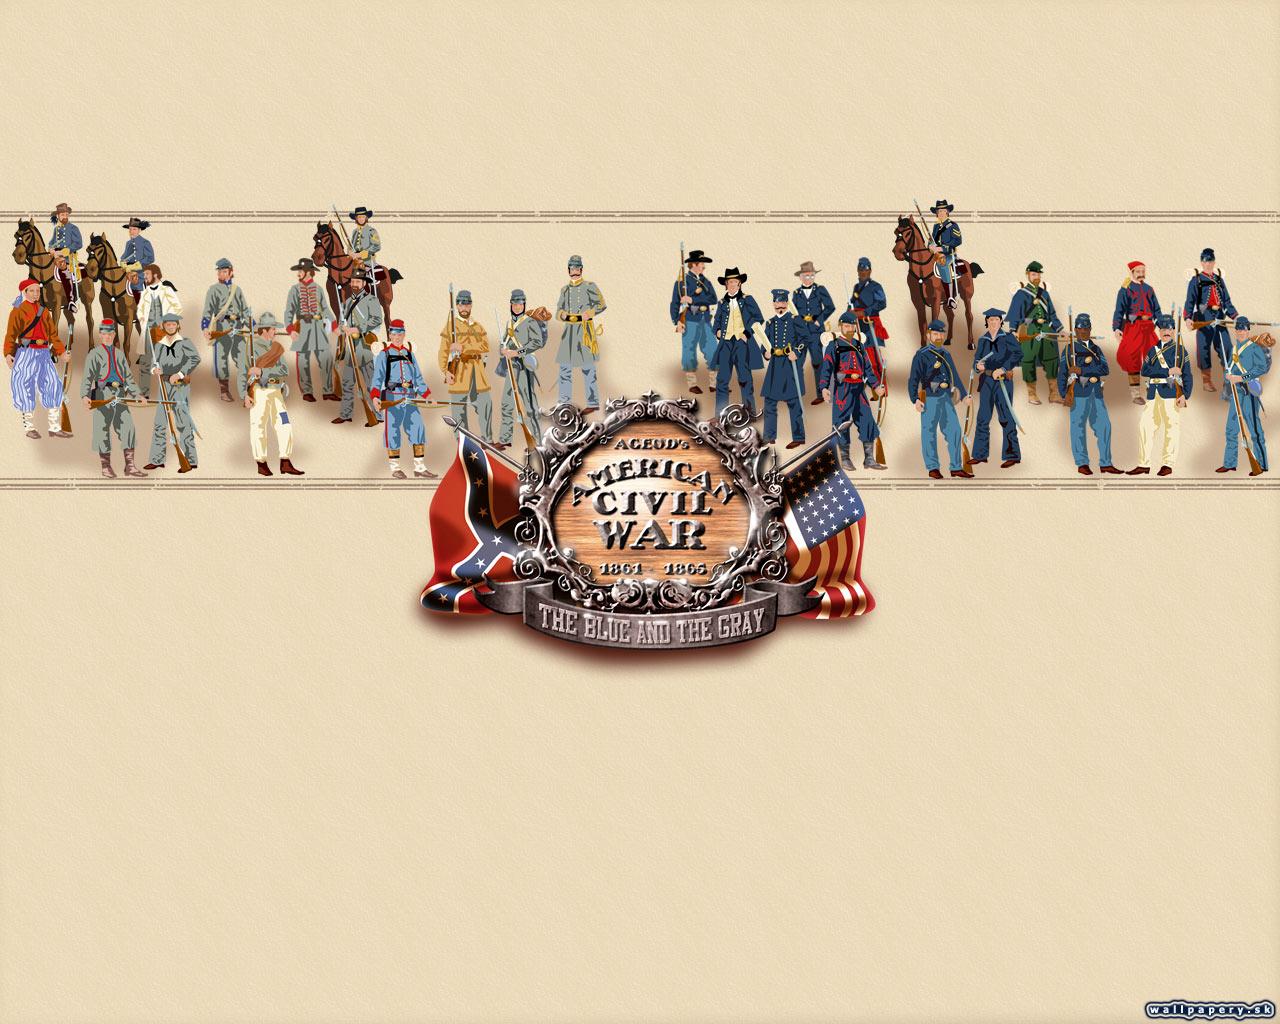 American Civil War Wallpaper Ageods american civil war 1280x1024